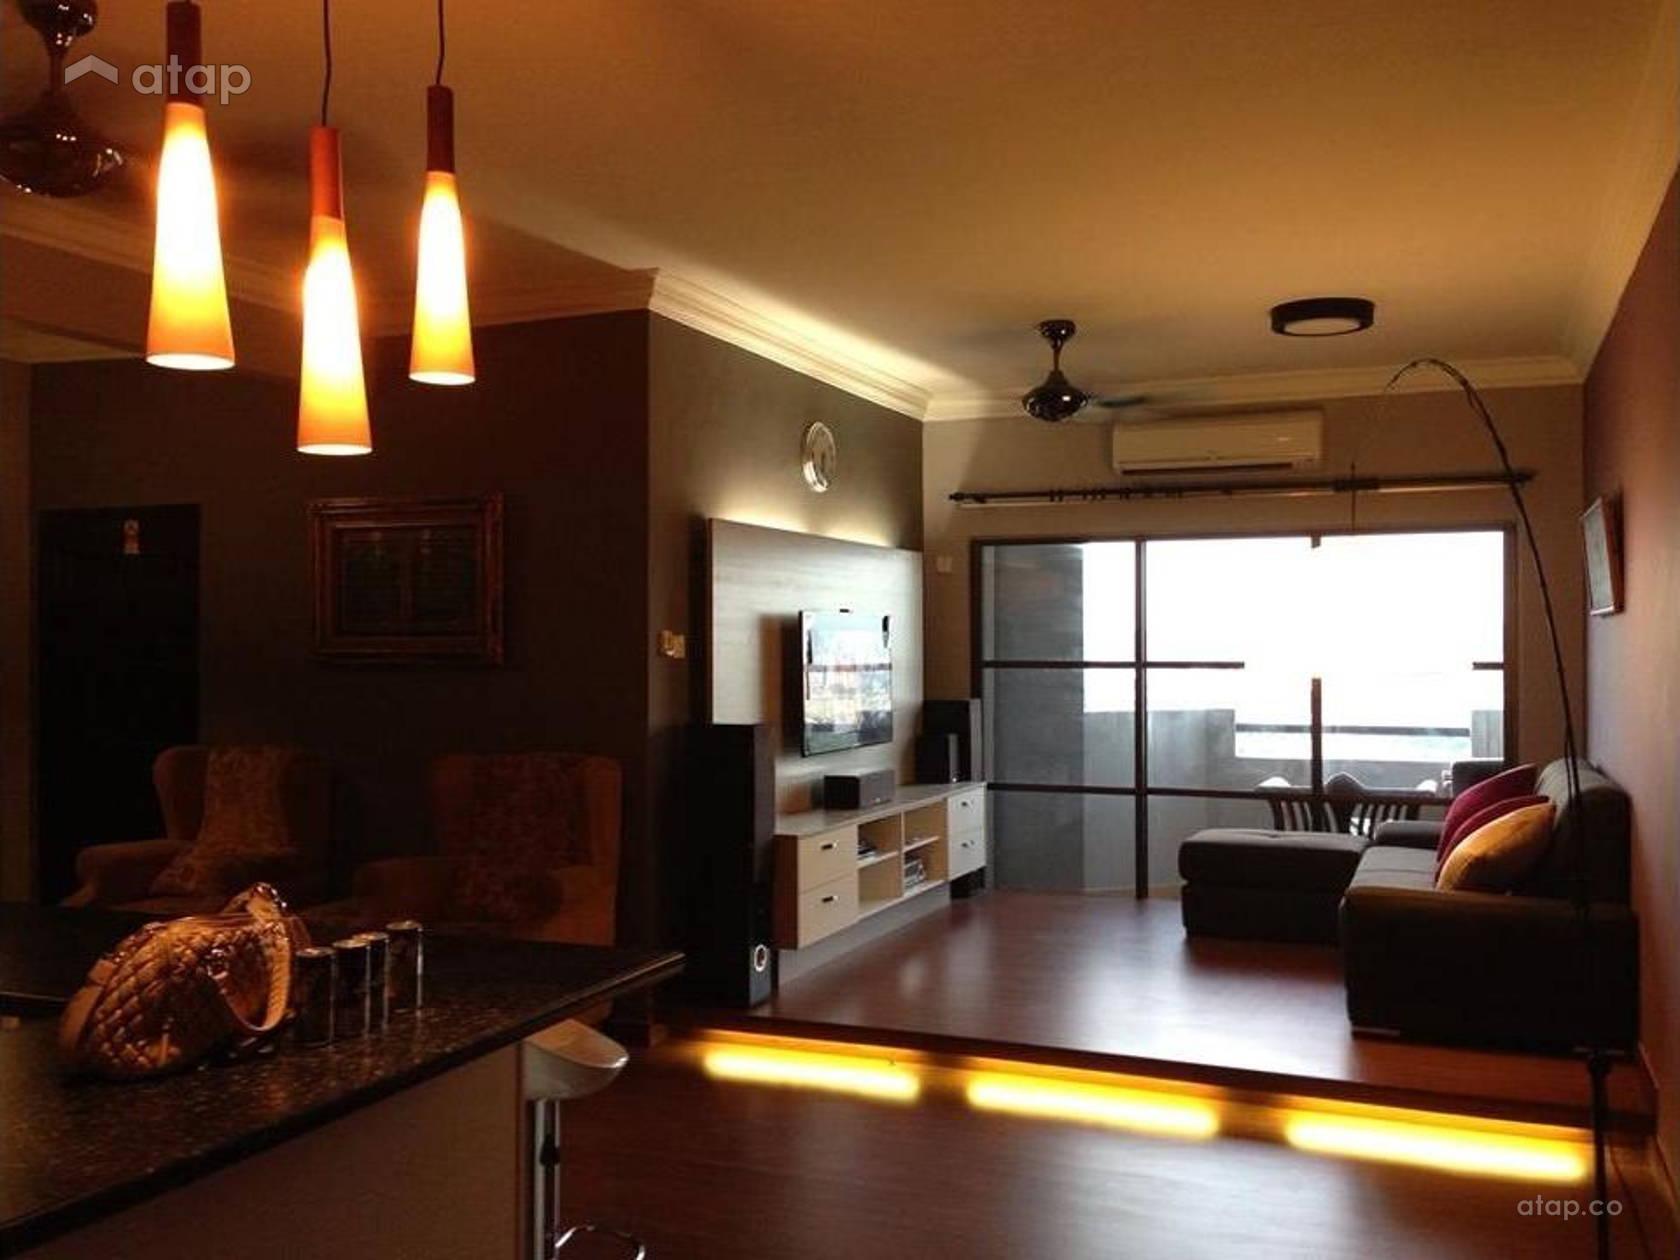 Residential - Villamas Apartment interior design renovation ideas ...